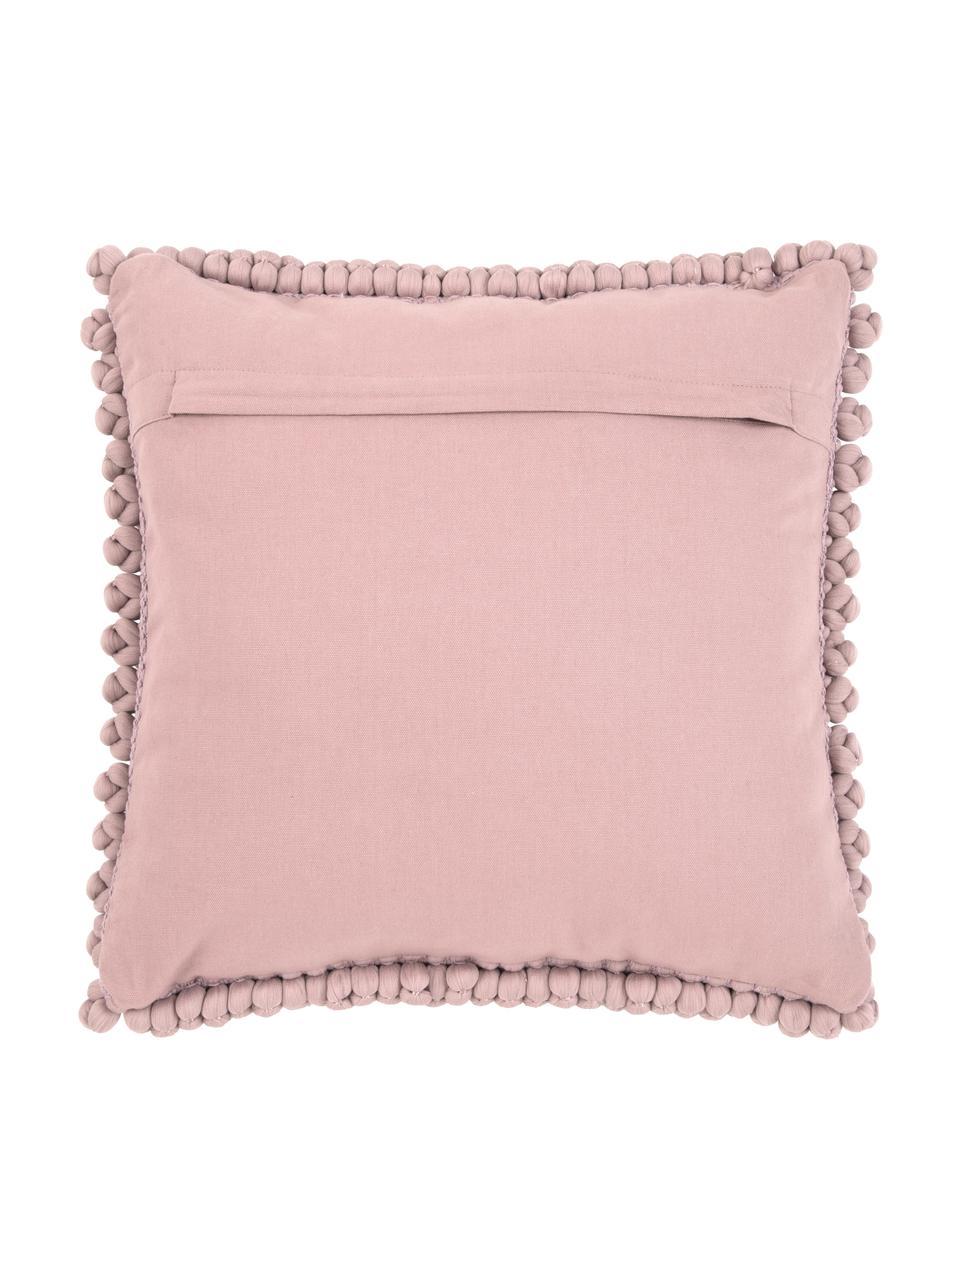 Federa arredo color rosa cipria Iona, Retro: cotone, Rosa cipria, Larg. 45 x Lung. 45 cm